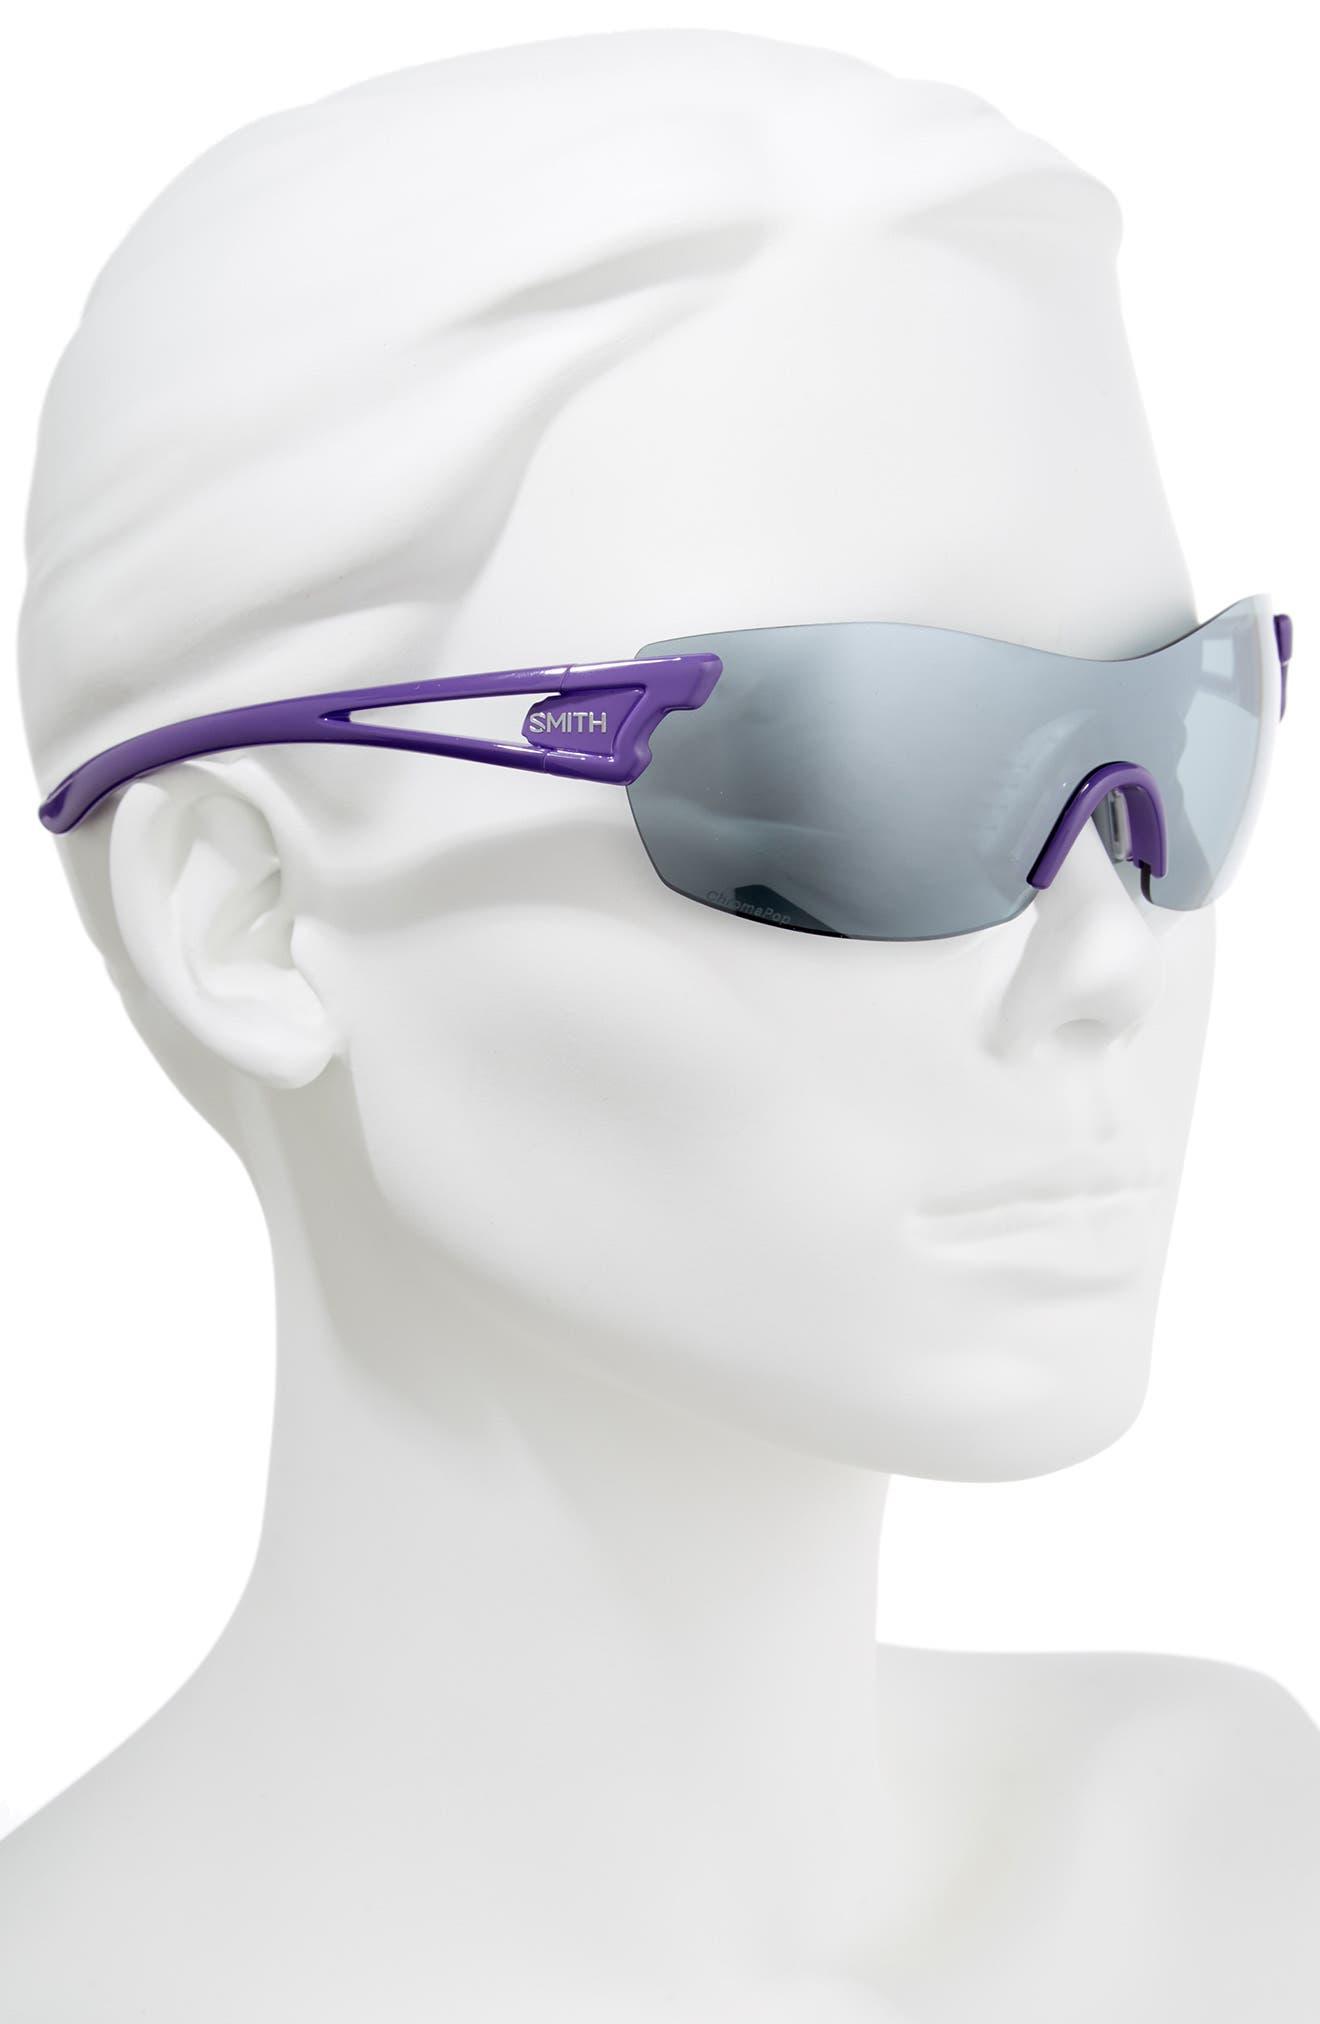 PivLock<sup>™</sup> Asana 150mm ChromaPop Polarized Sunglasses,                             Alternate thumbnail 2, color,                             Violet